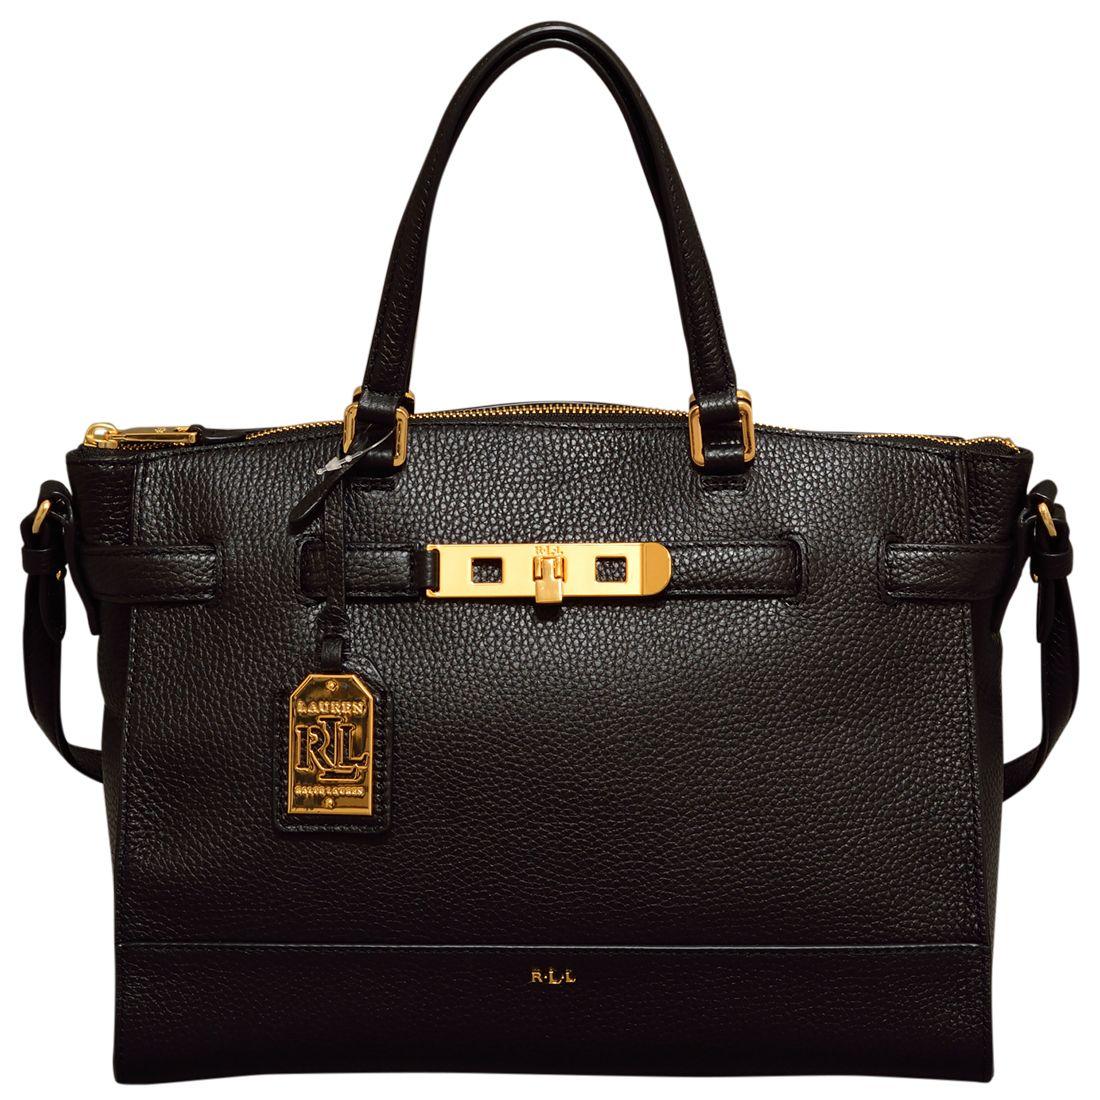 28ede6ec078b ... 431562381001 darwin bucket bag for women leather black e3fbc 0299c   coupon code for ralph lauren darwin satchel handbag womens b252b 4e5ac